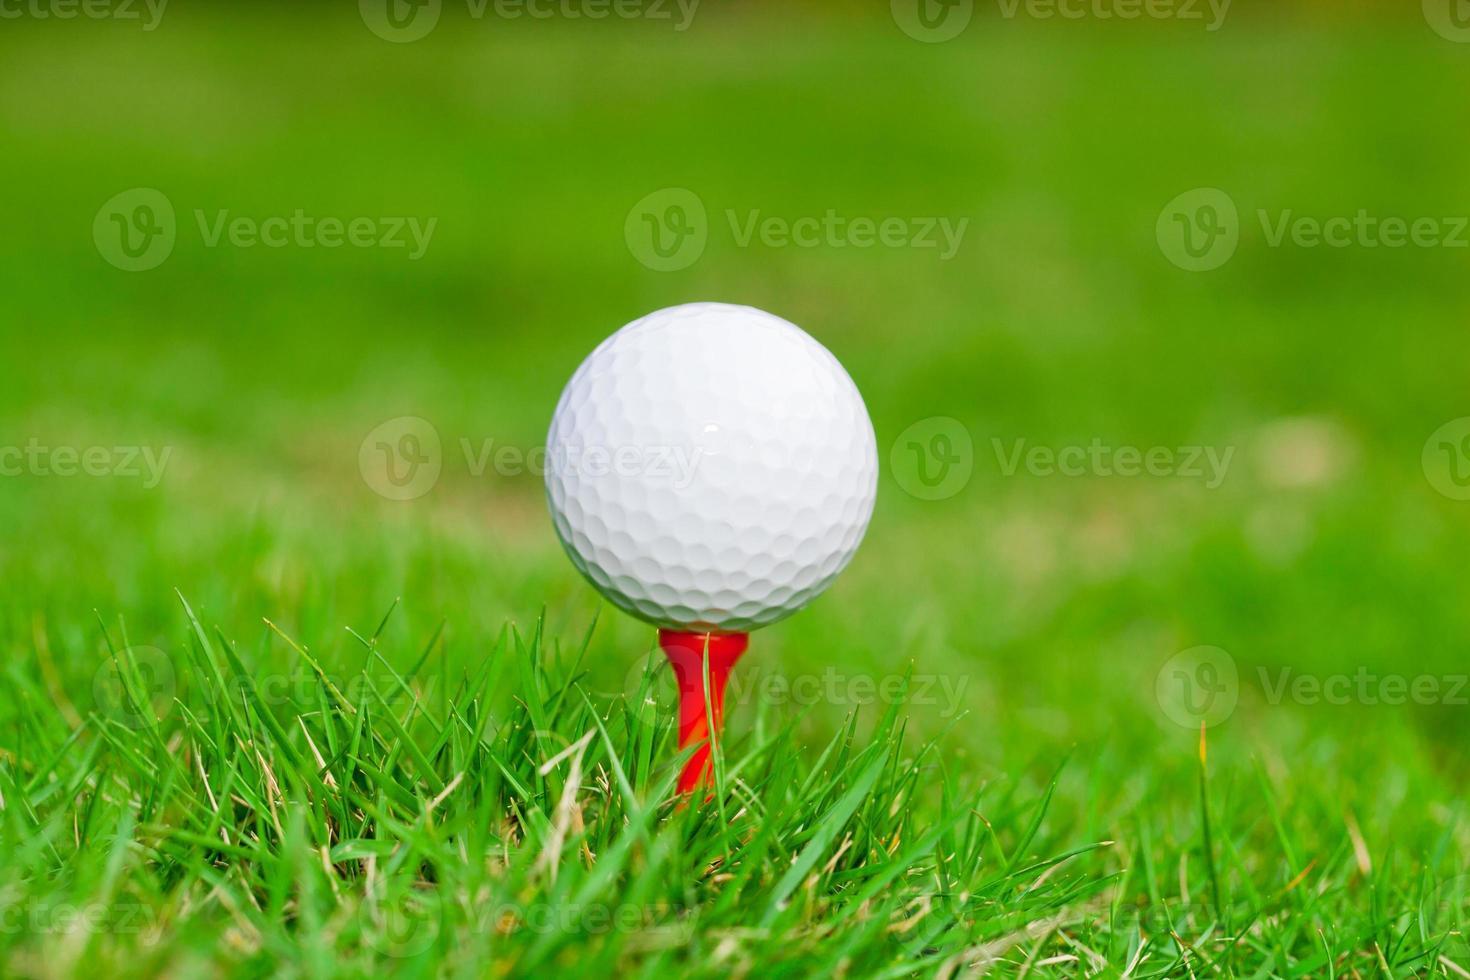 pallina da golf sul tee. erba verde. foto